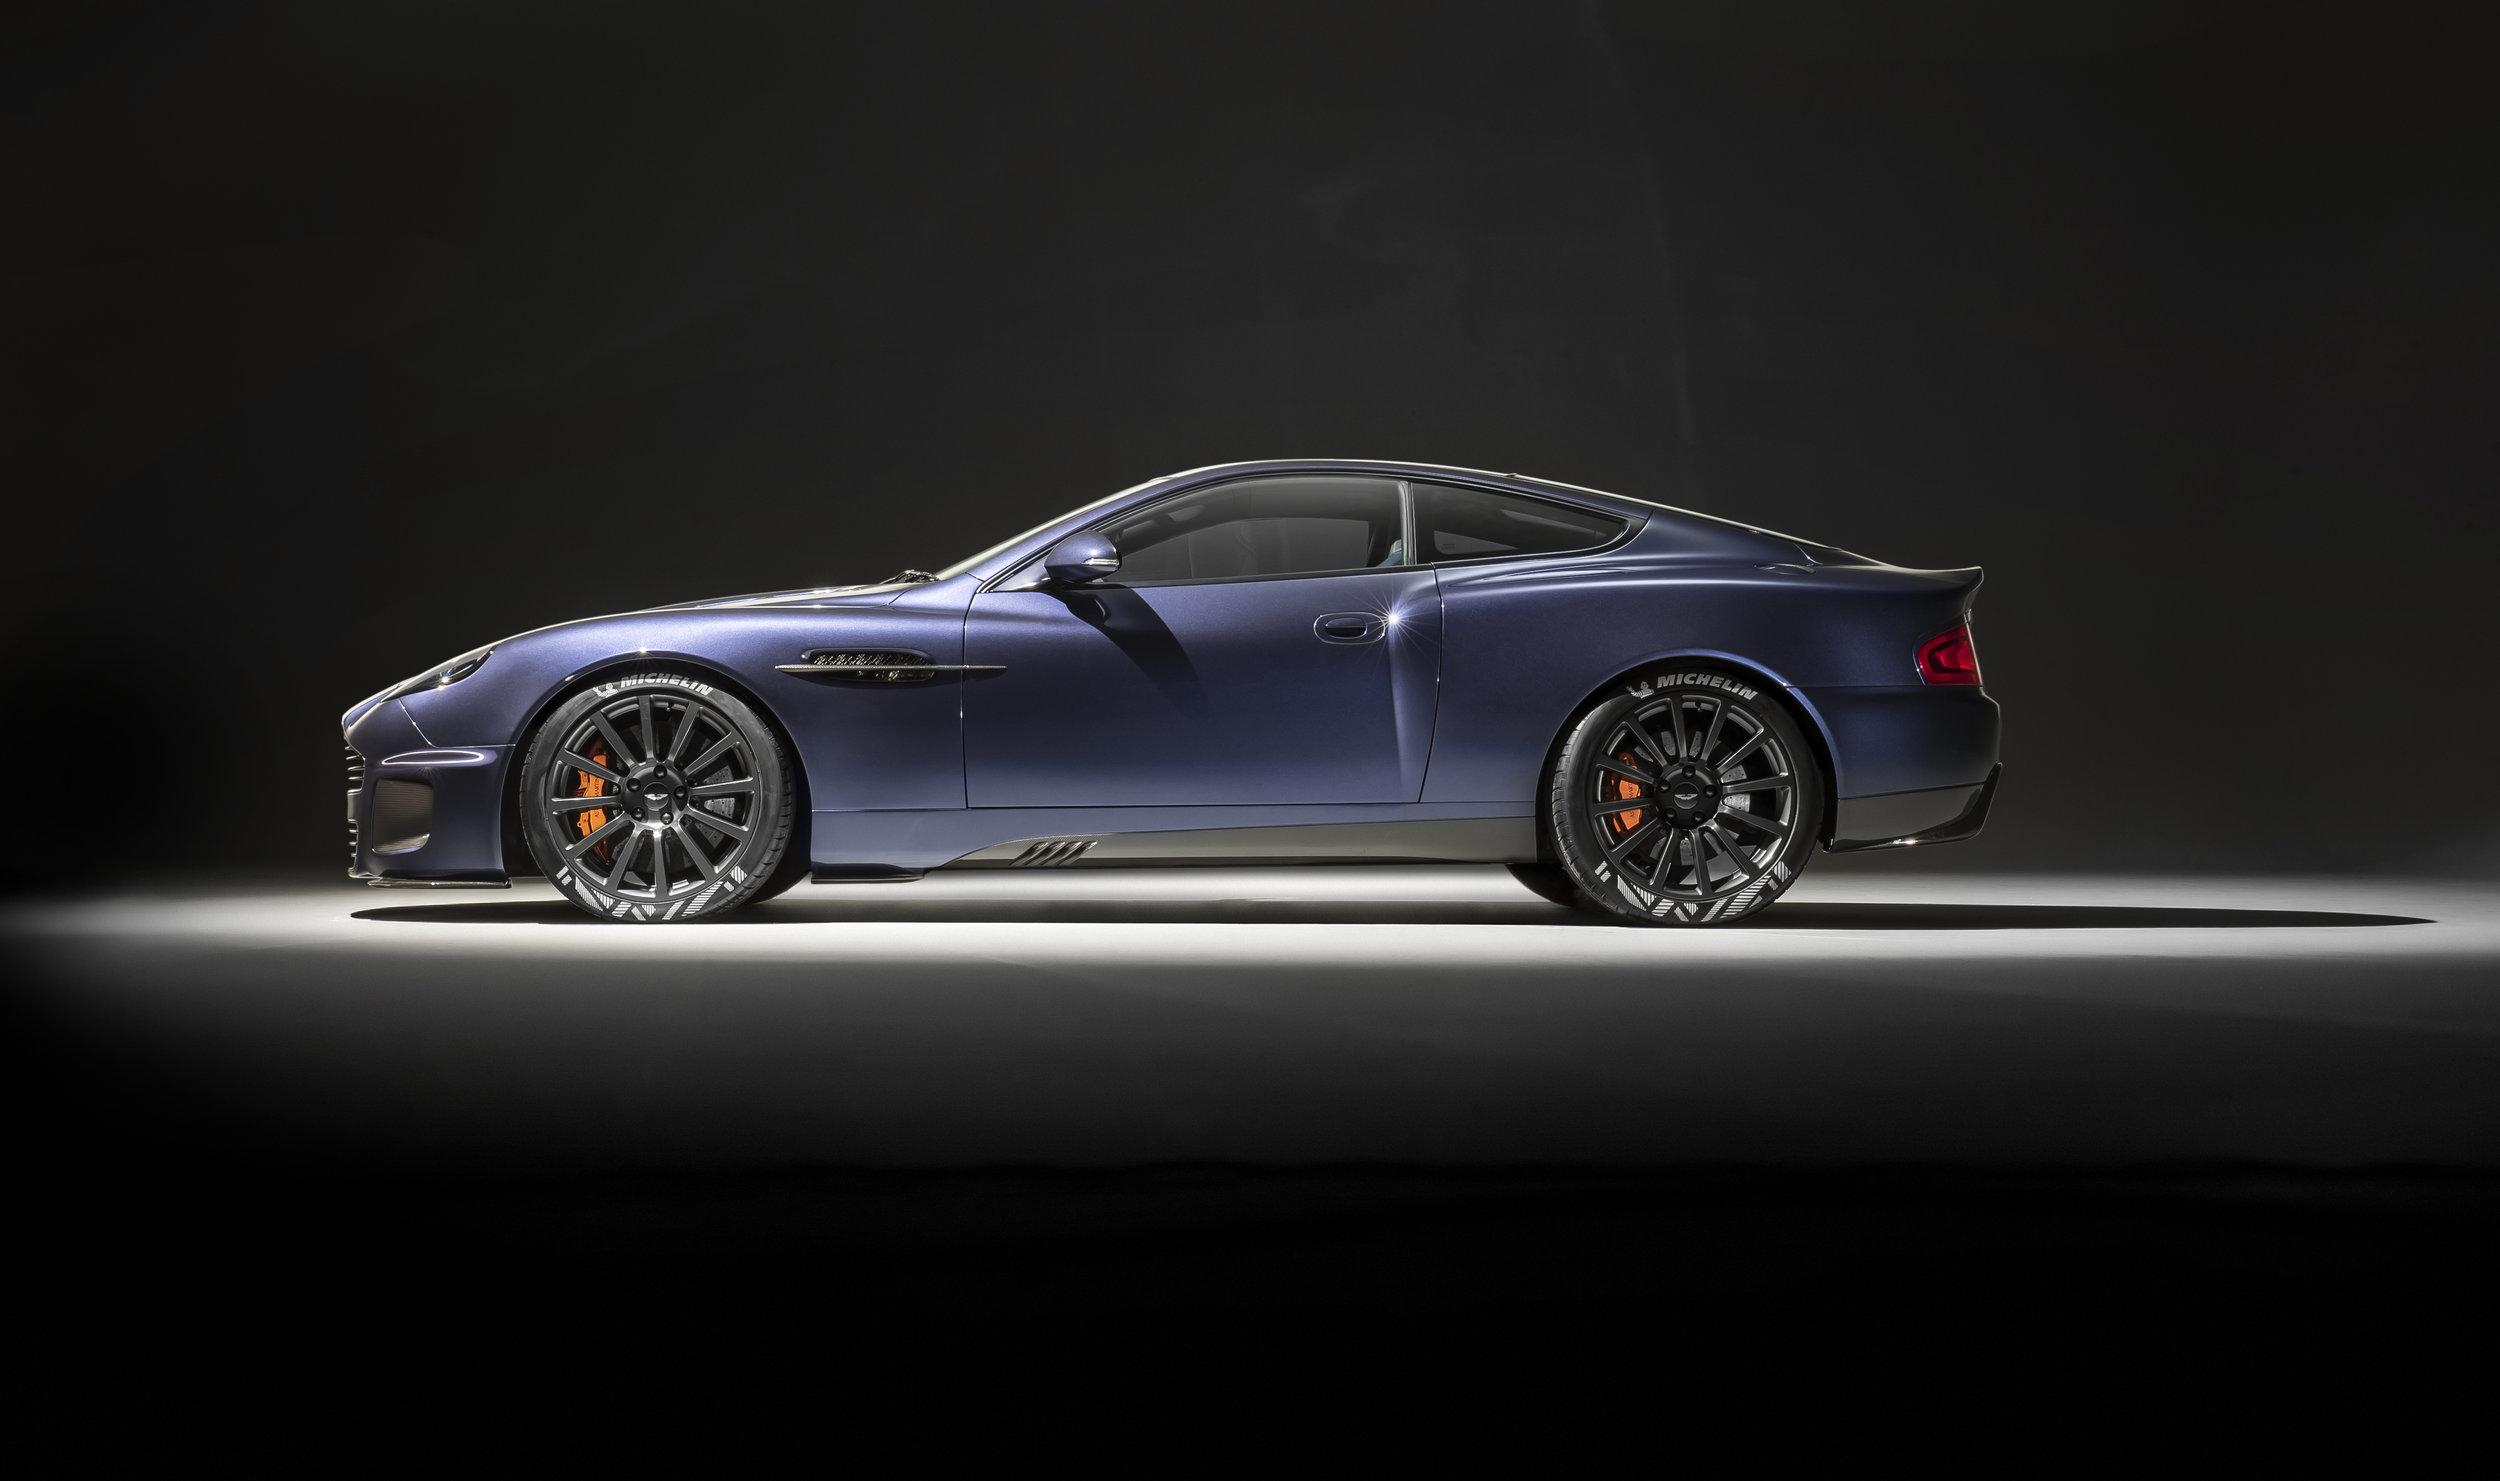 Aston Martin Vanquish 25 by CALLUM (4).jpg